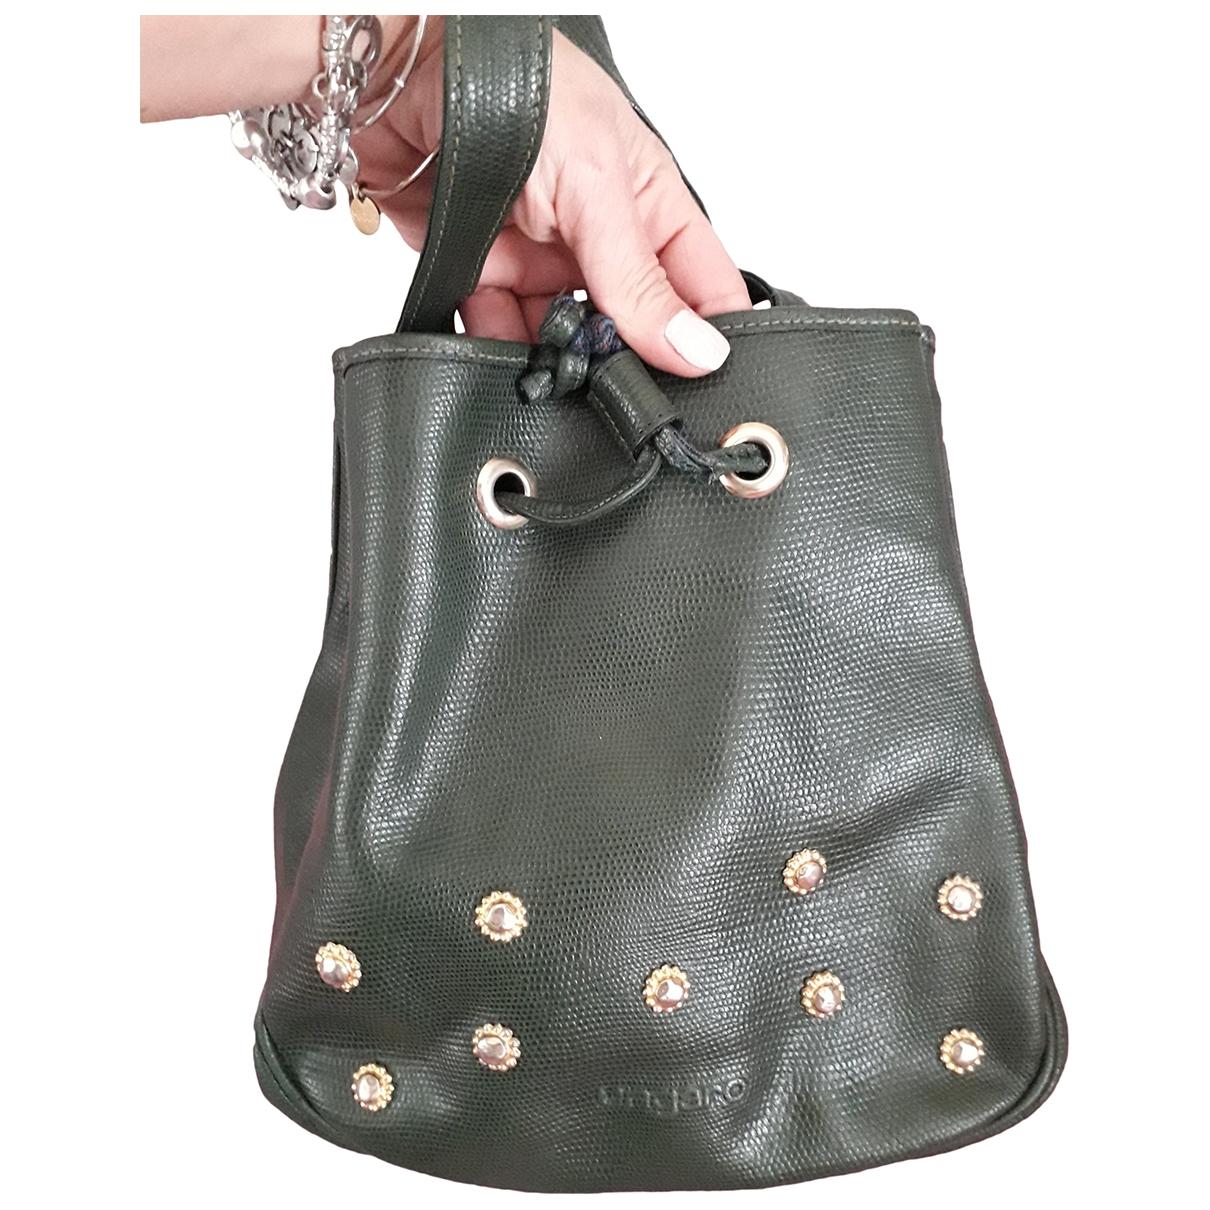 Emanuel Ungaro \N Green Leather handbag for Women \N